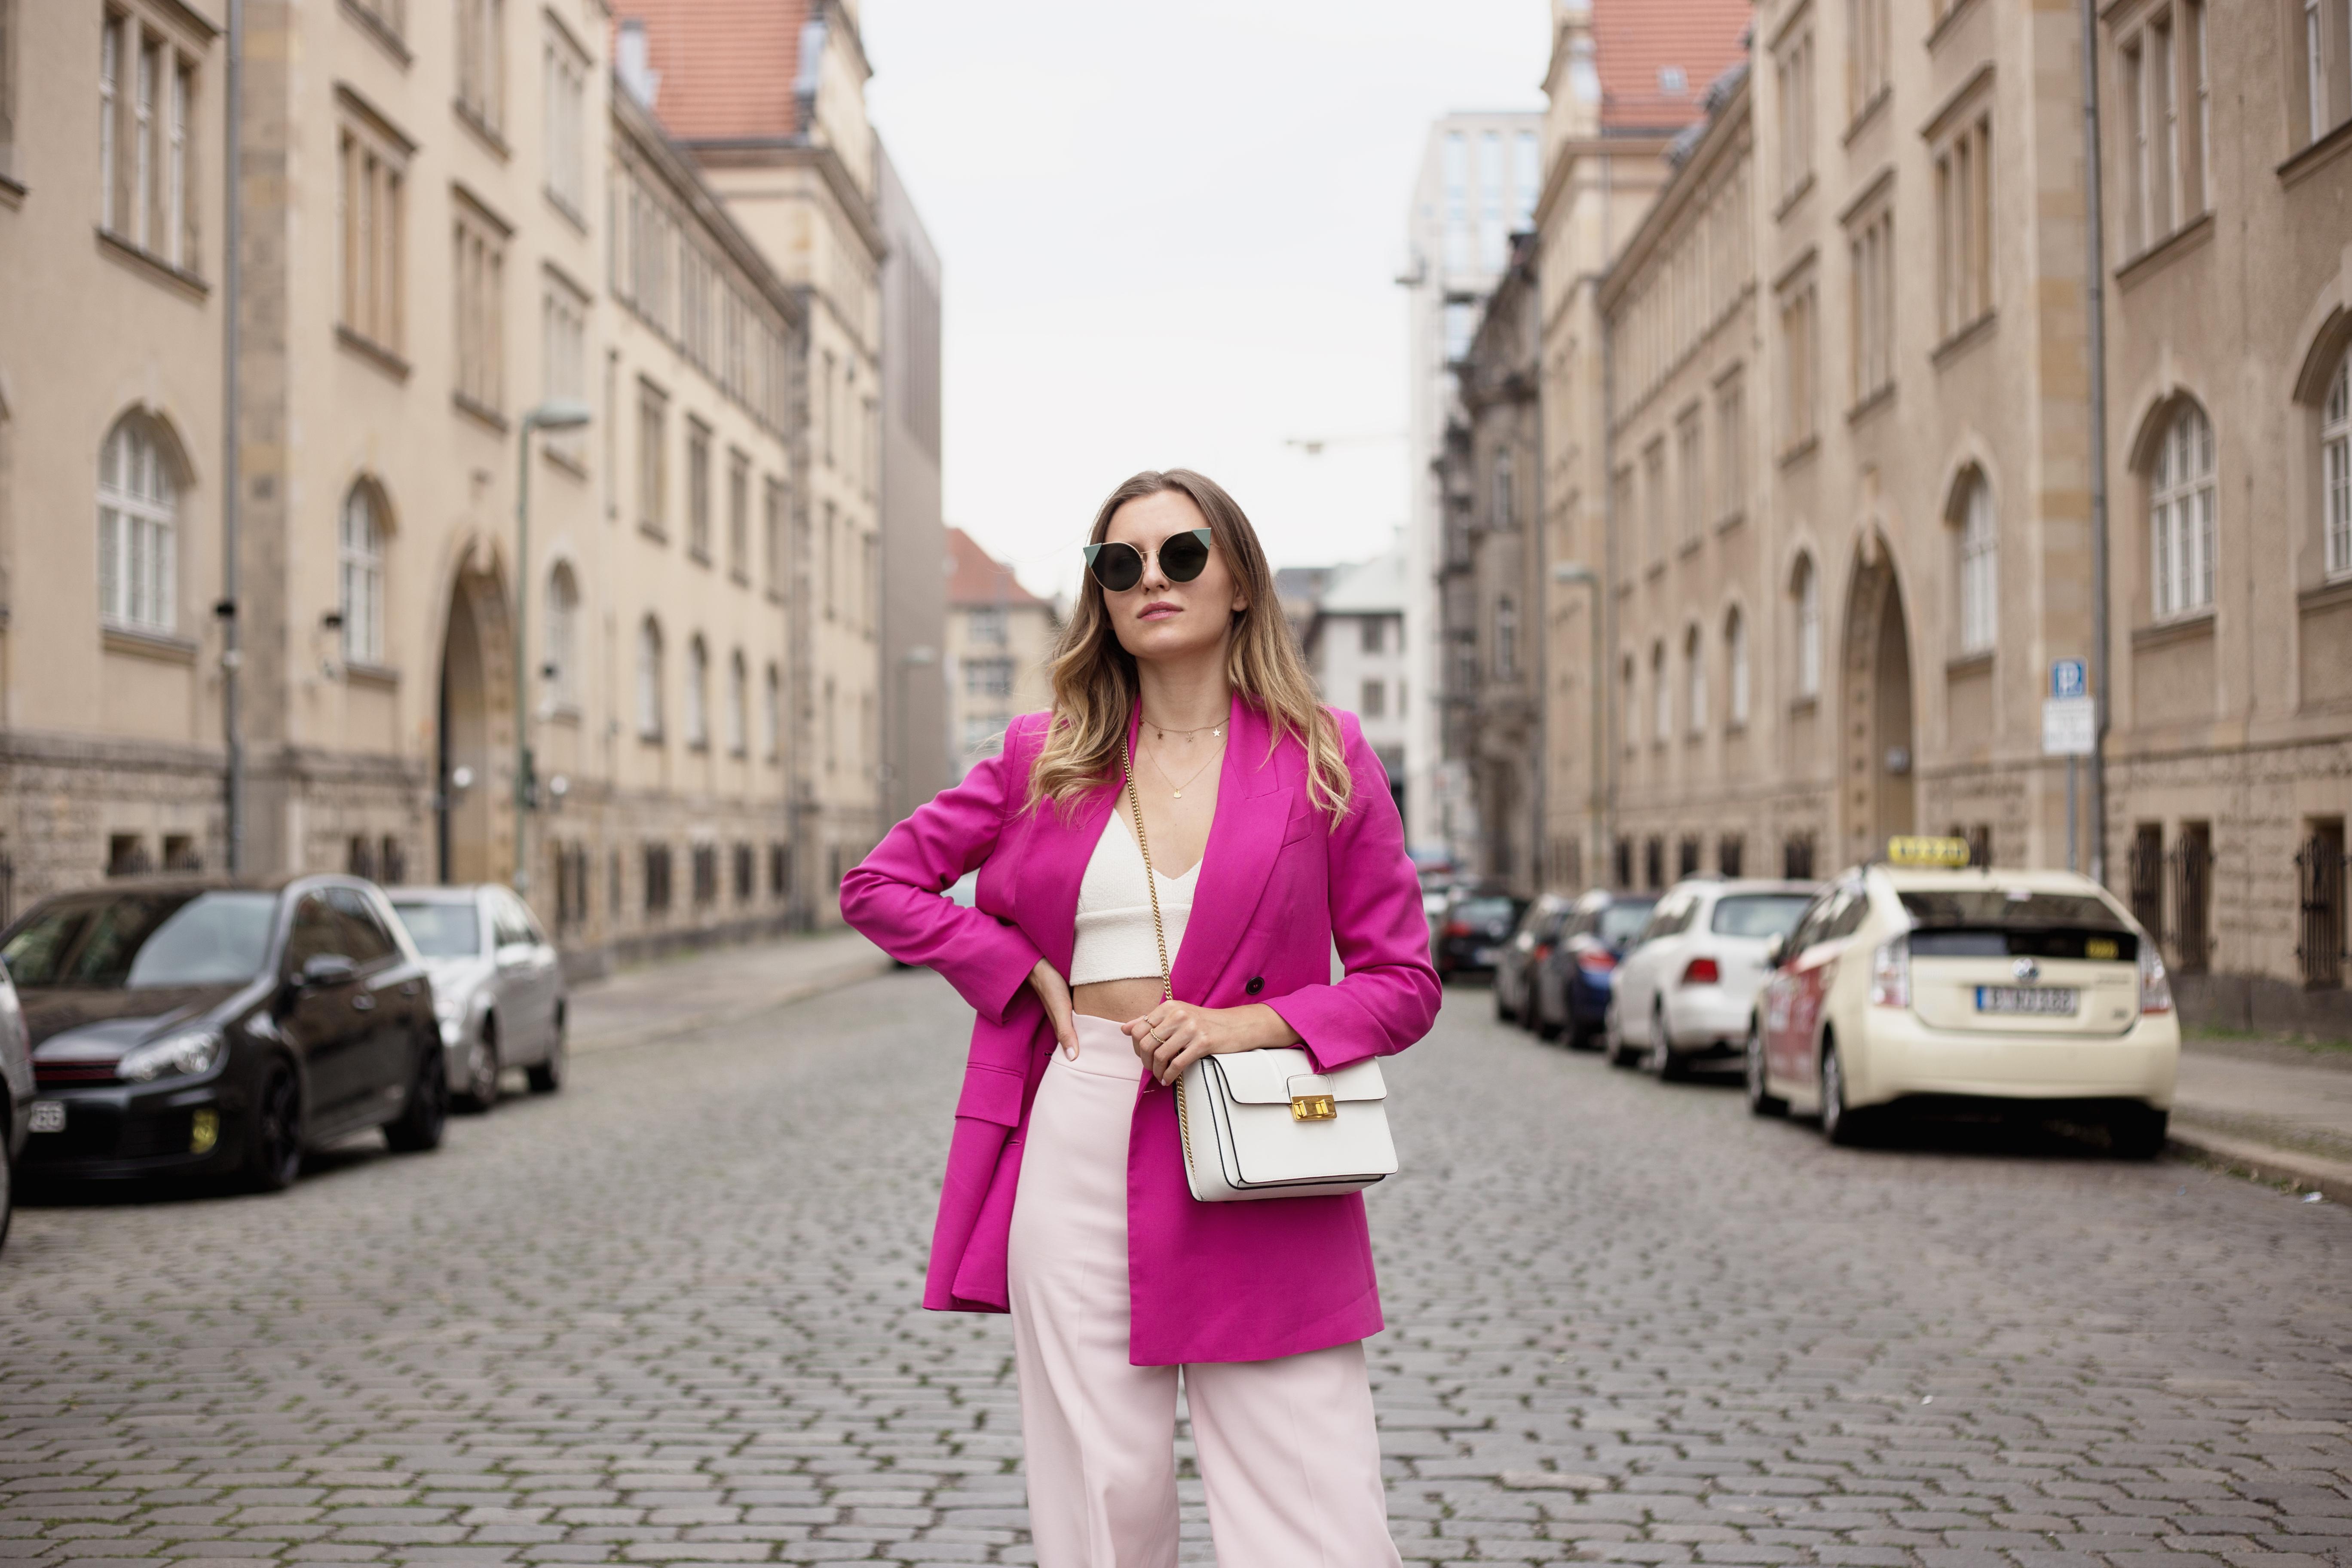 fendi-lei-sunglasses-hermes-oran-livia-auer-IMG_9387